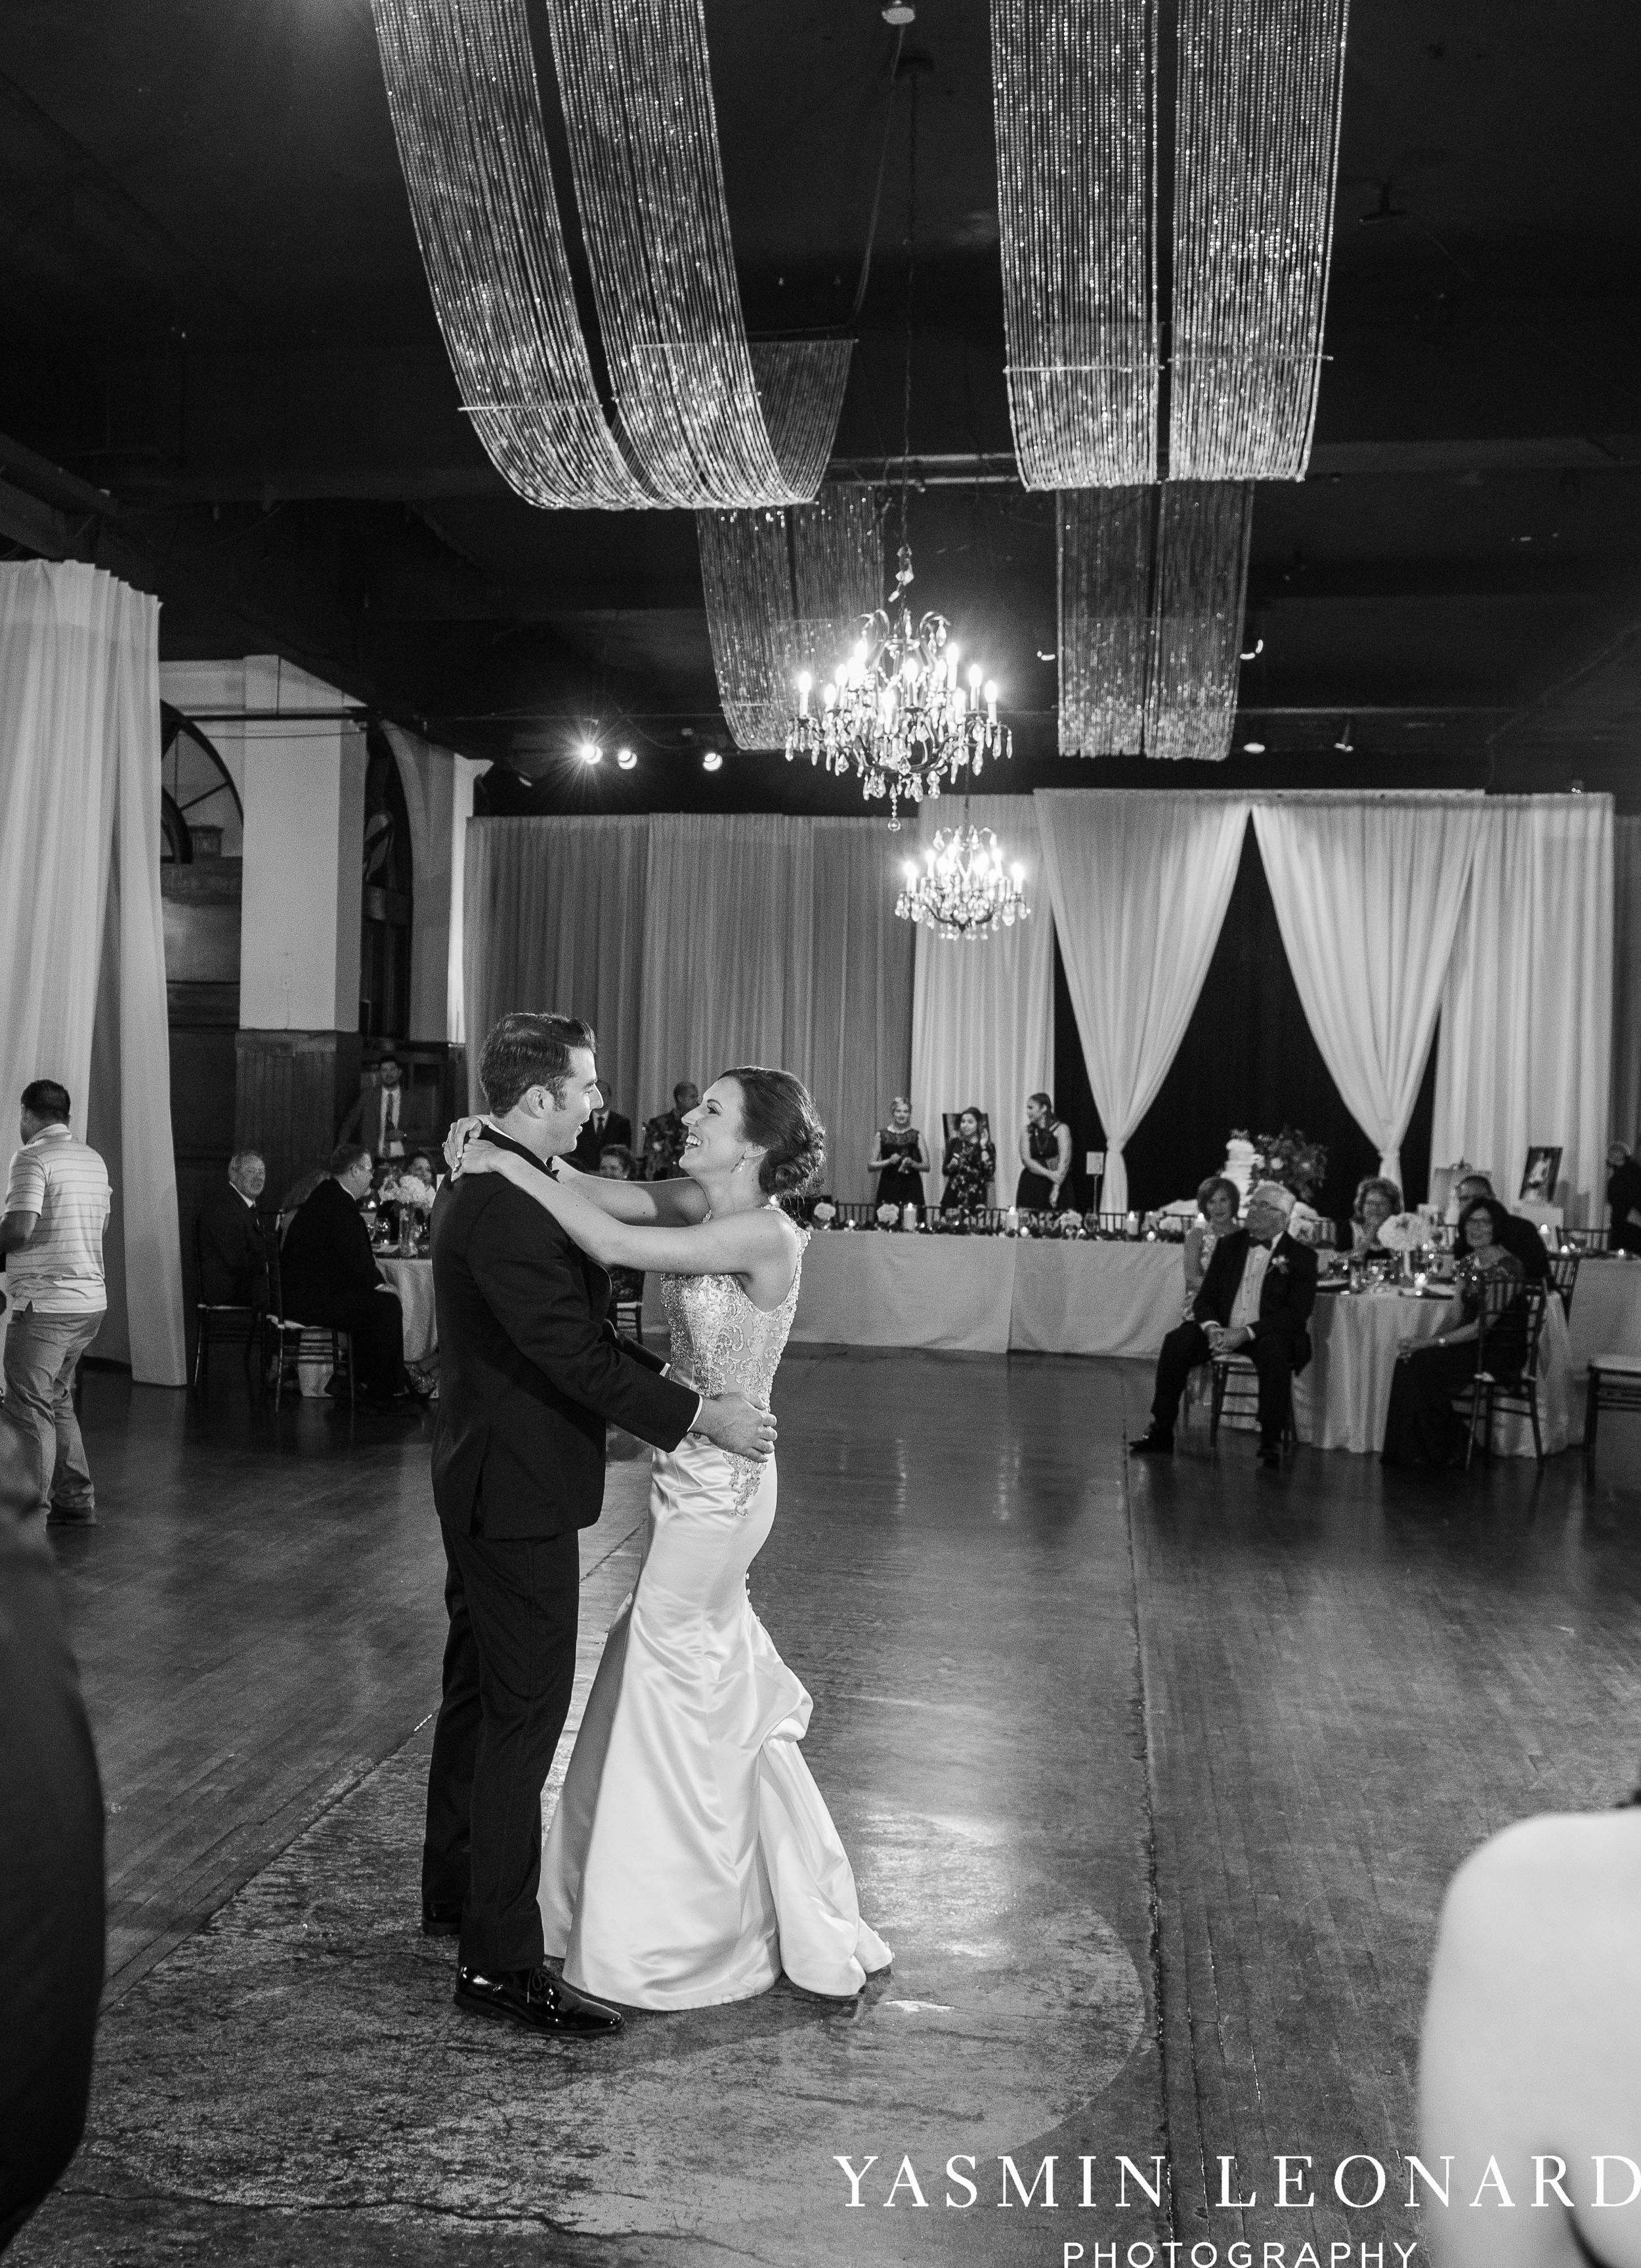 Millennium Center Wedding - Downtown Winston Salem - Winston Salem Wedding Photographer - Winston Salem Venues - Indoor Wedding Venues - NC Wedding Photographer - Yasmin Leonard Photography-72.jpg